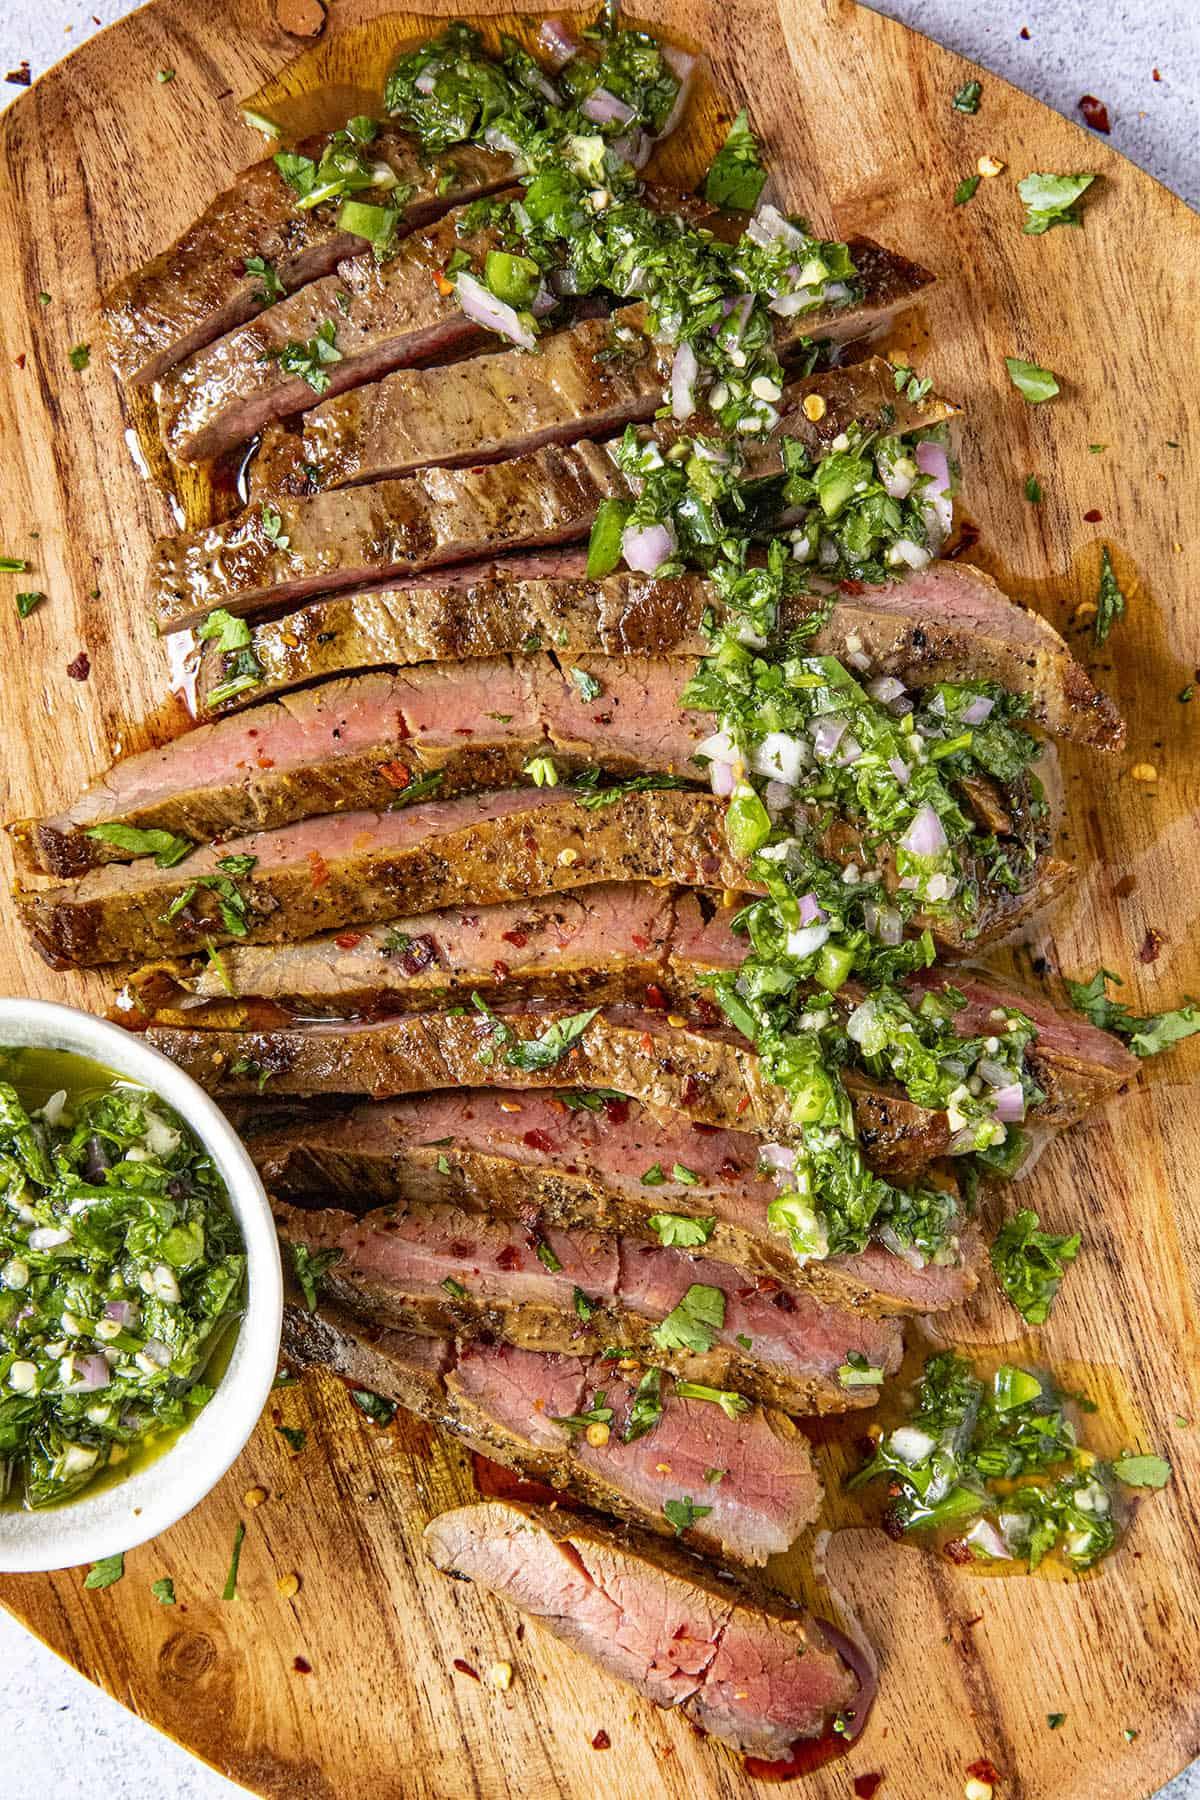 Chimichurri Steak on a platter, ready to serve